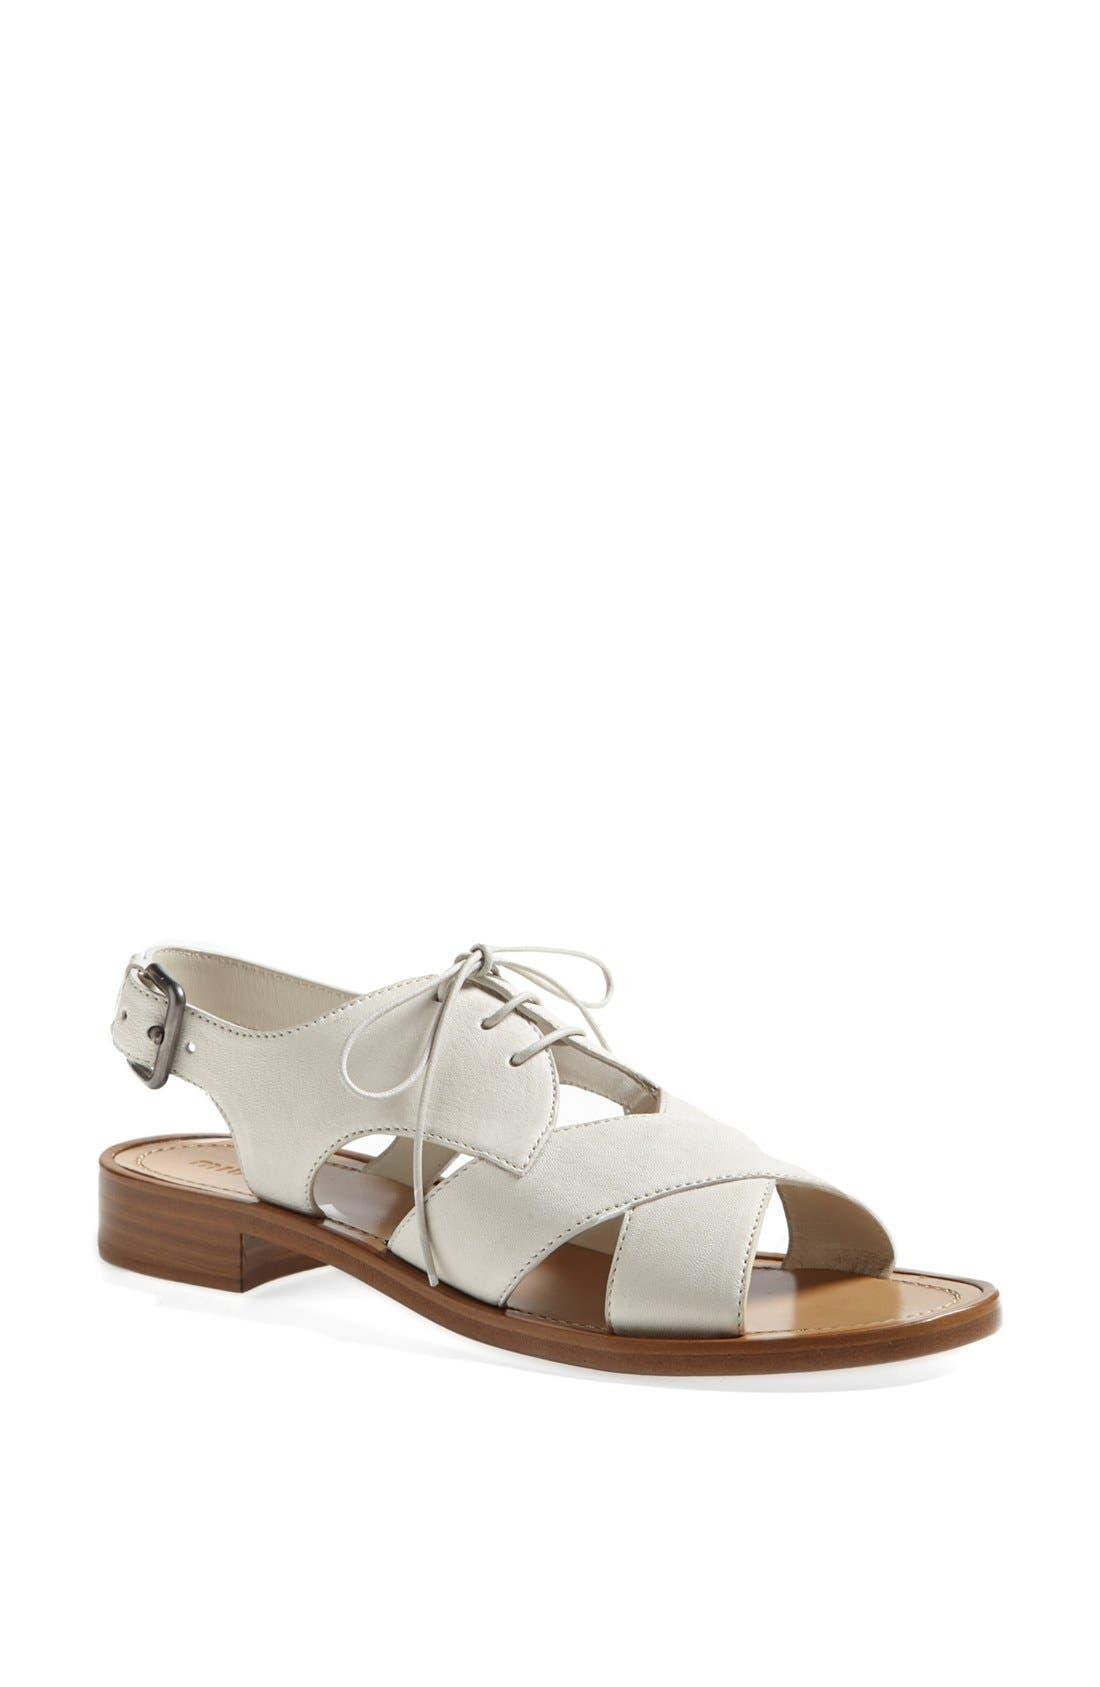 Alternate Image 1 Selected - Miu Miu Lace-Up Sandal